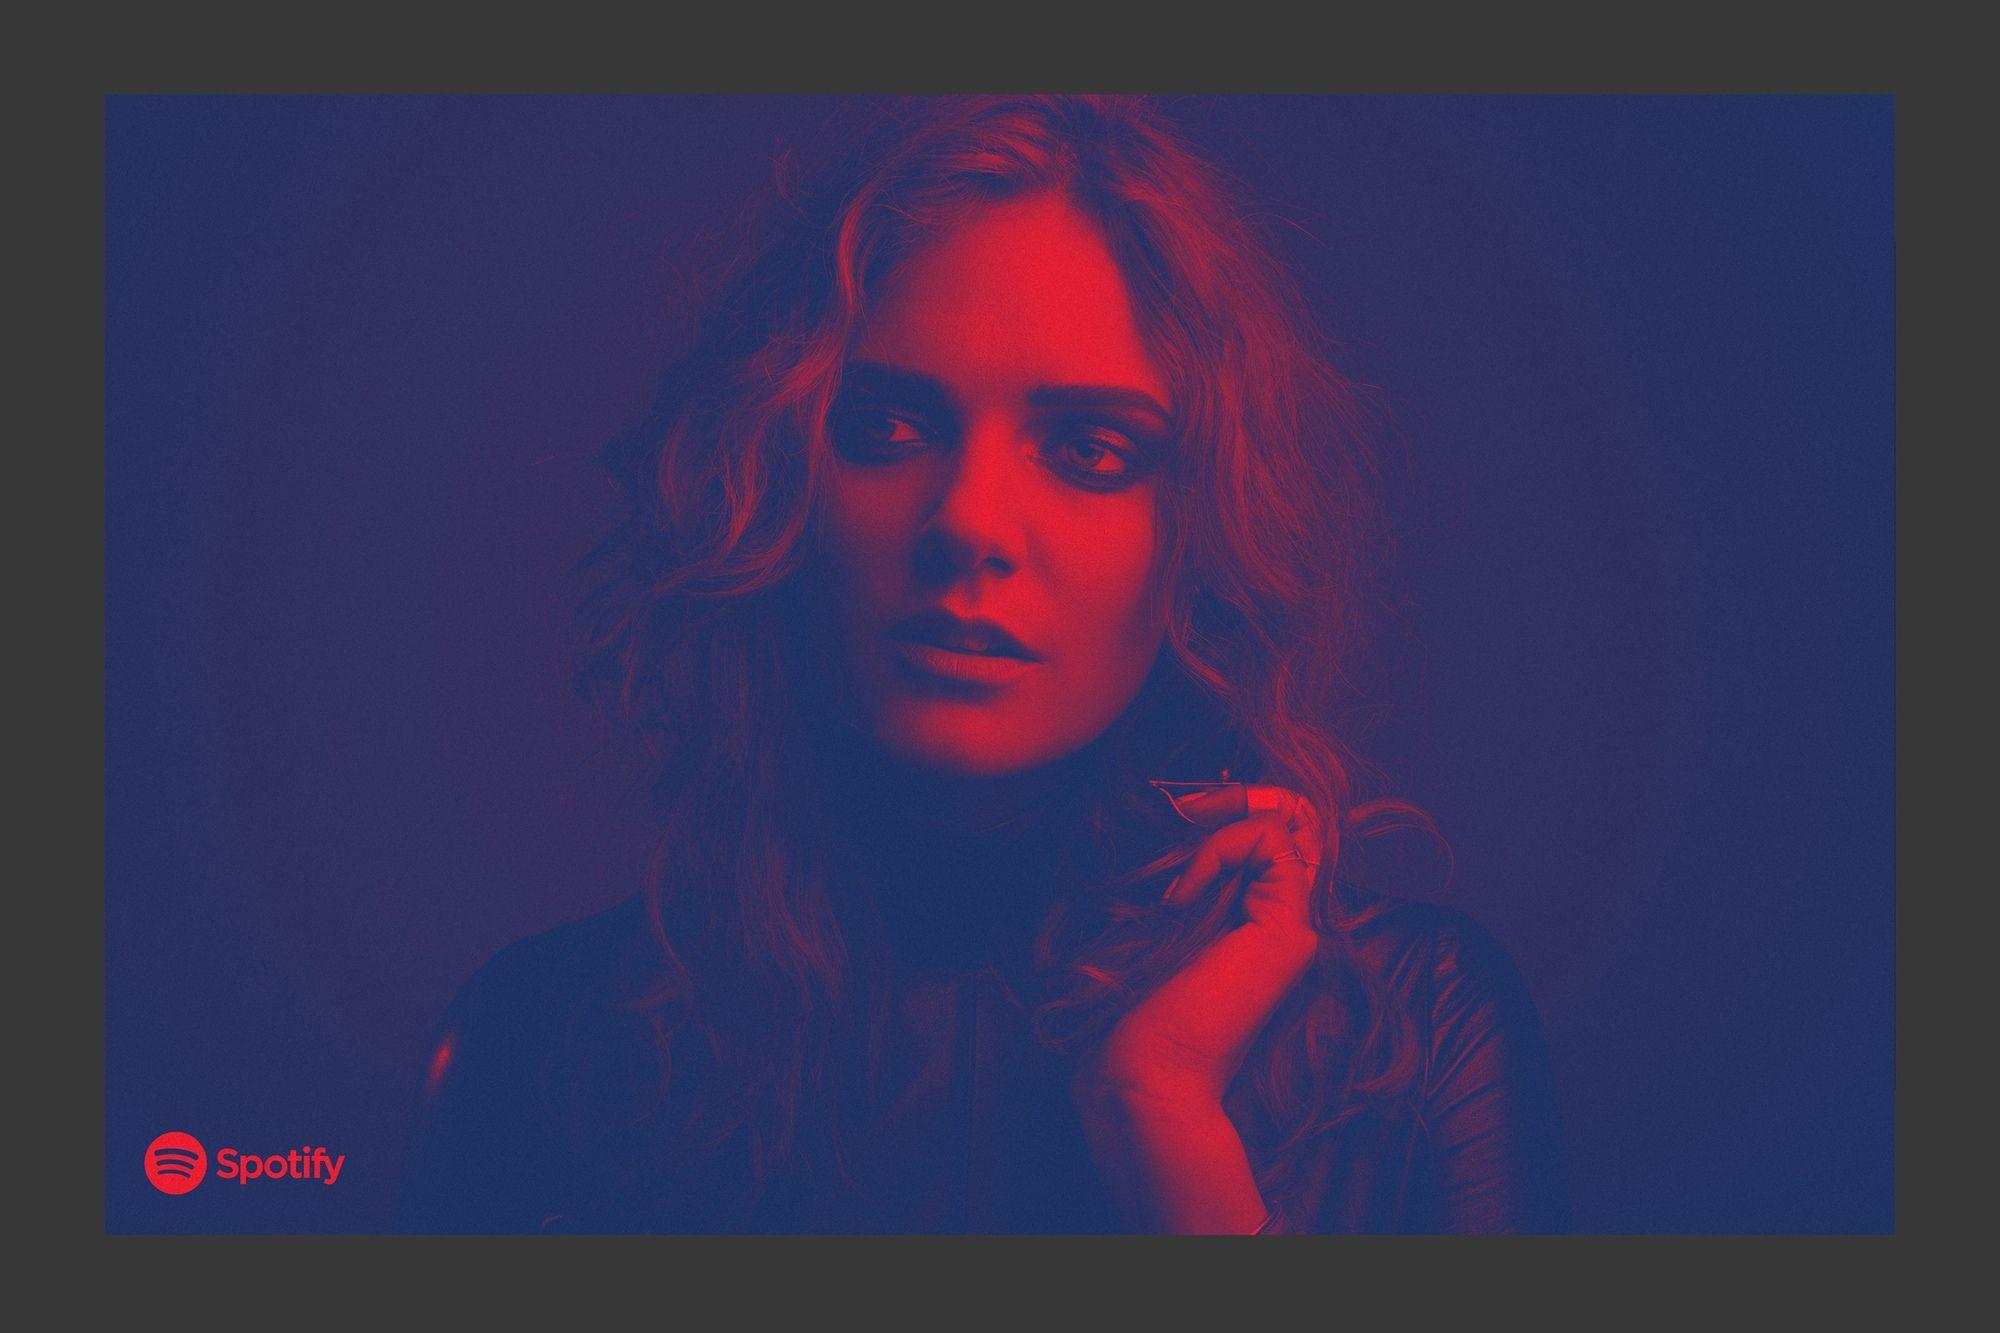 Spotify – Collins